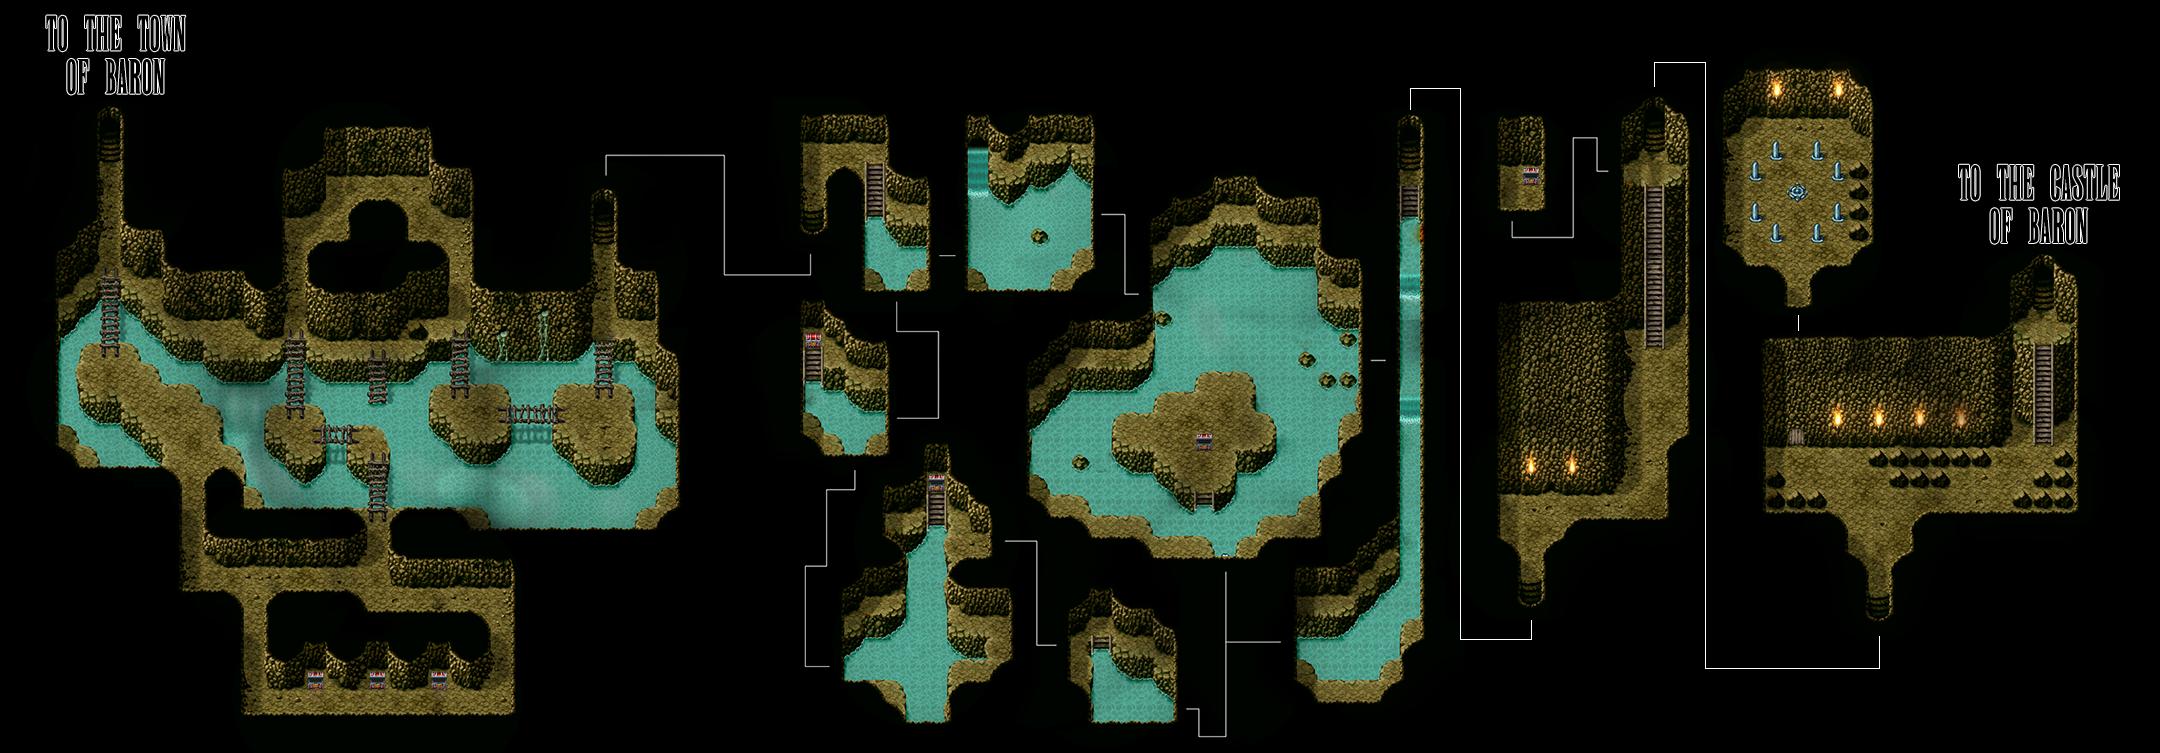 Ancient Waterway